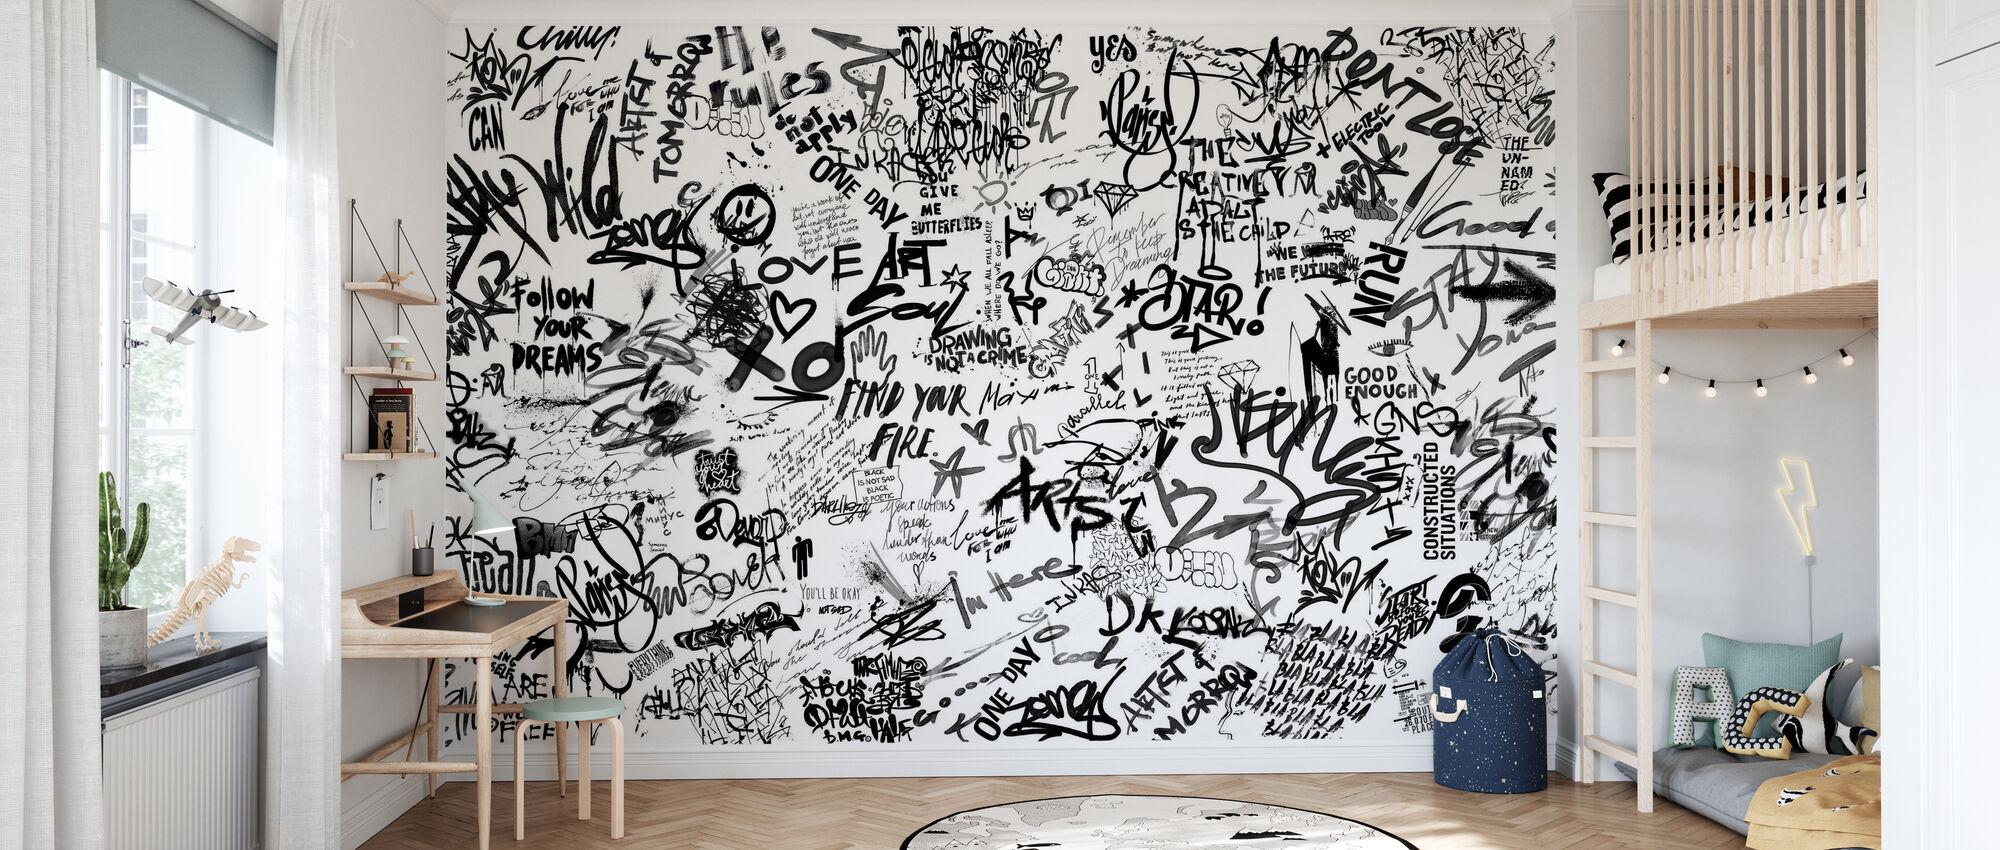 Street Art Poetry - Bw - Wallpaper - Kids Room